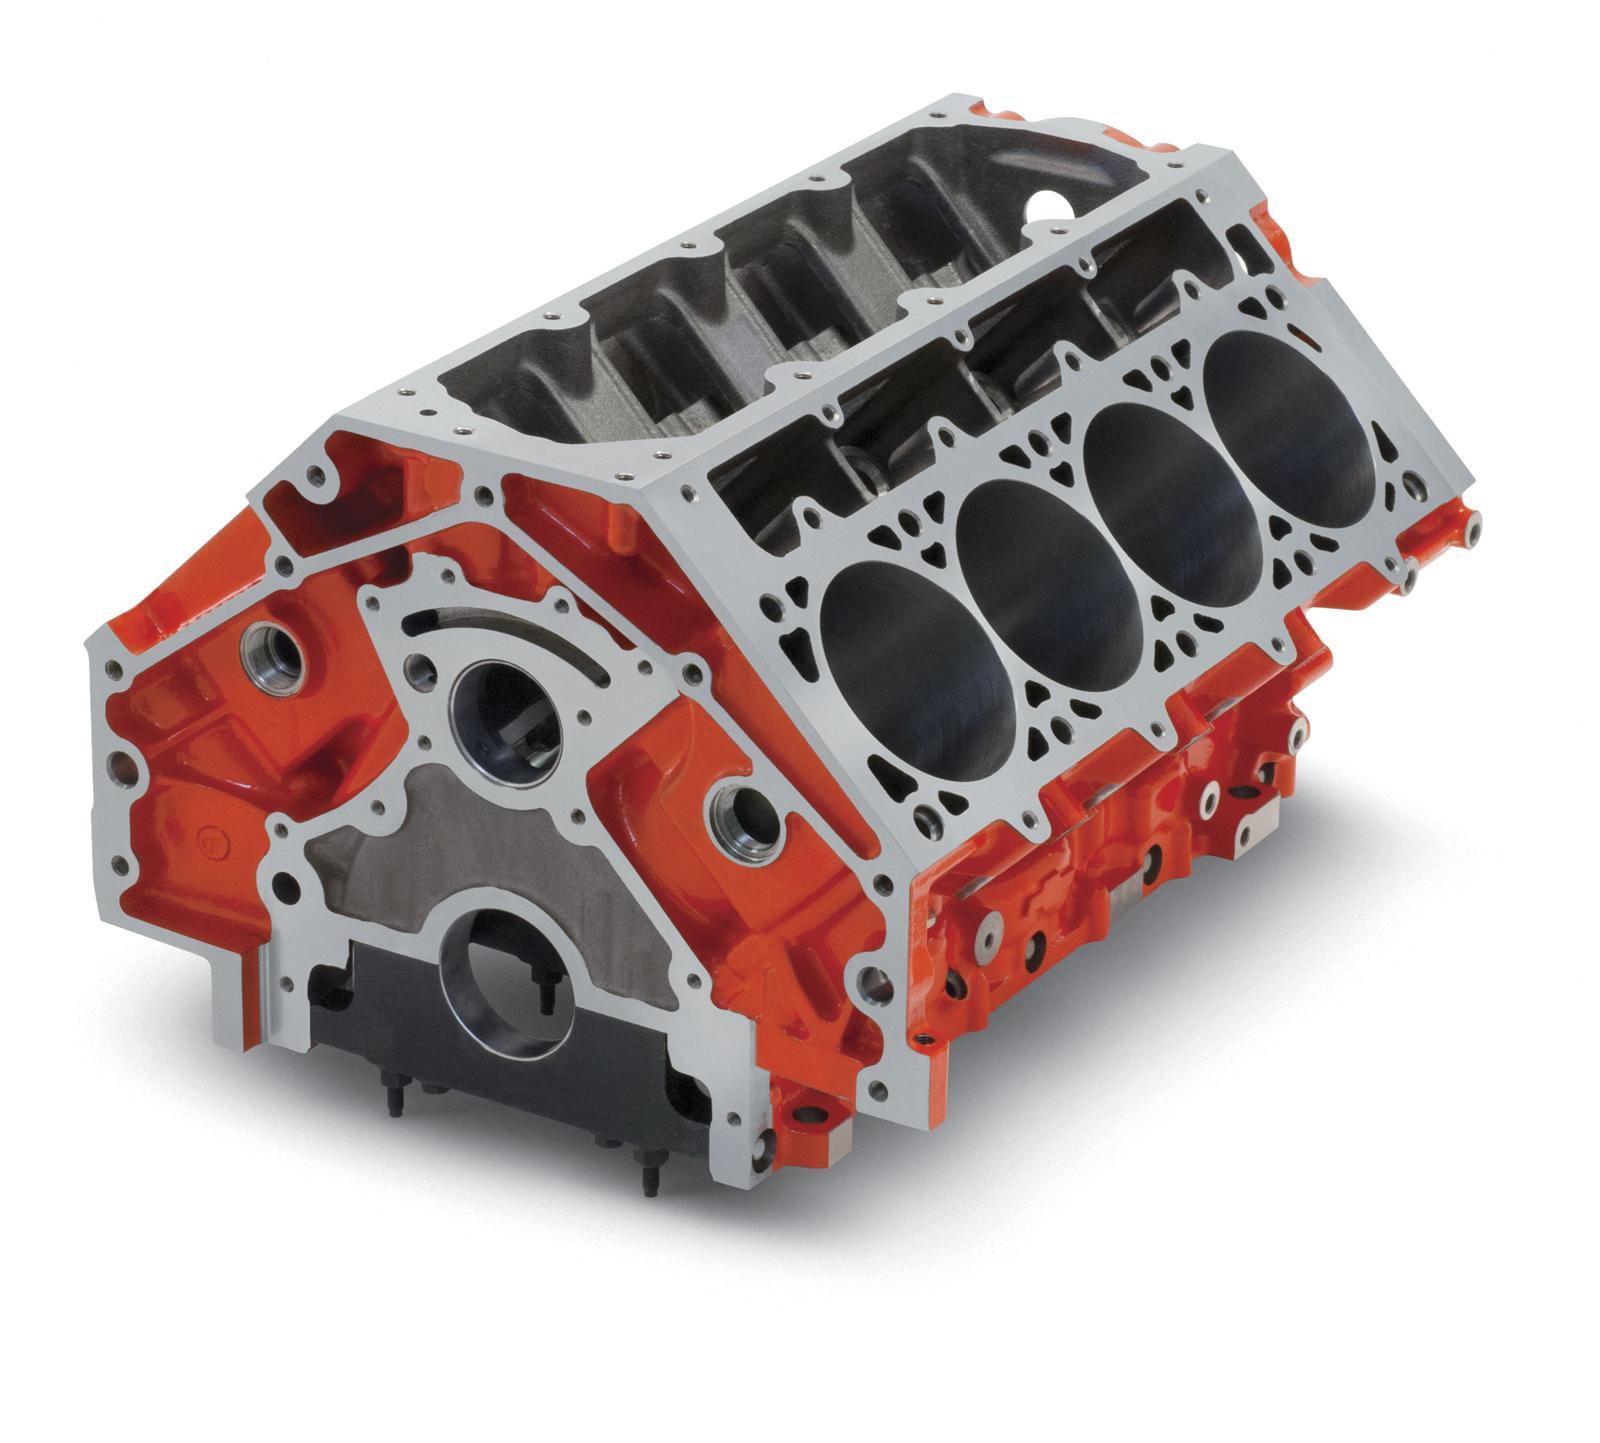 Chevrolet Performance Lsx Bowtie Engine Block 19260093 Ebay